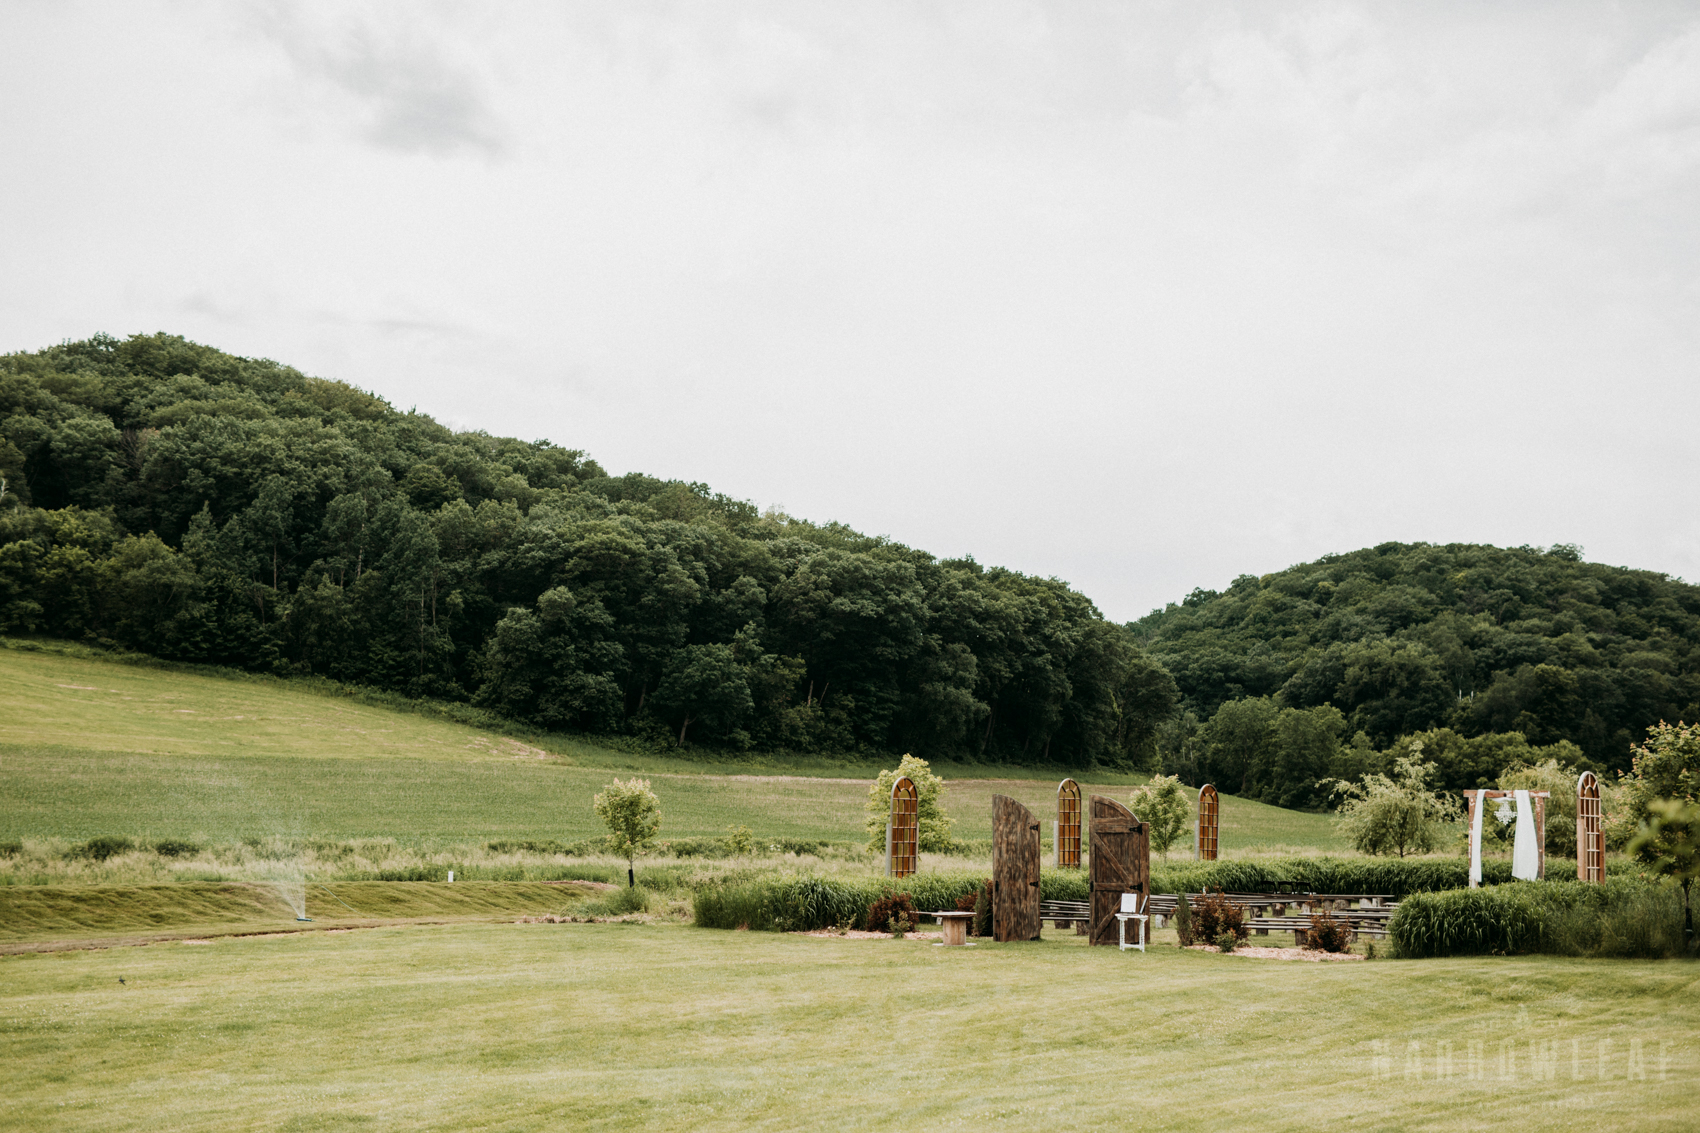 classy-wedding-details-the-hidden-meadow-and-barn-pepin-wi-11.jpg